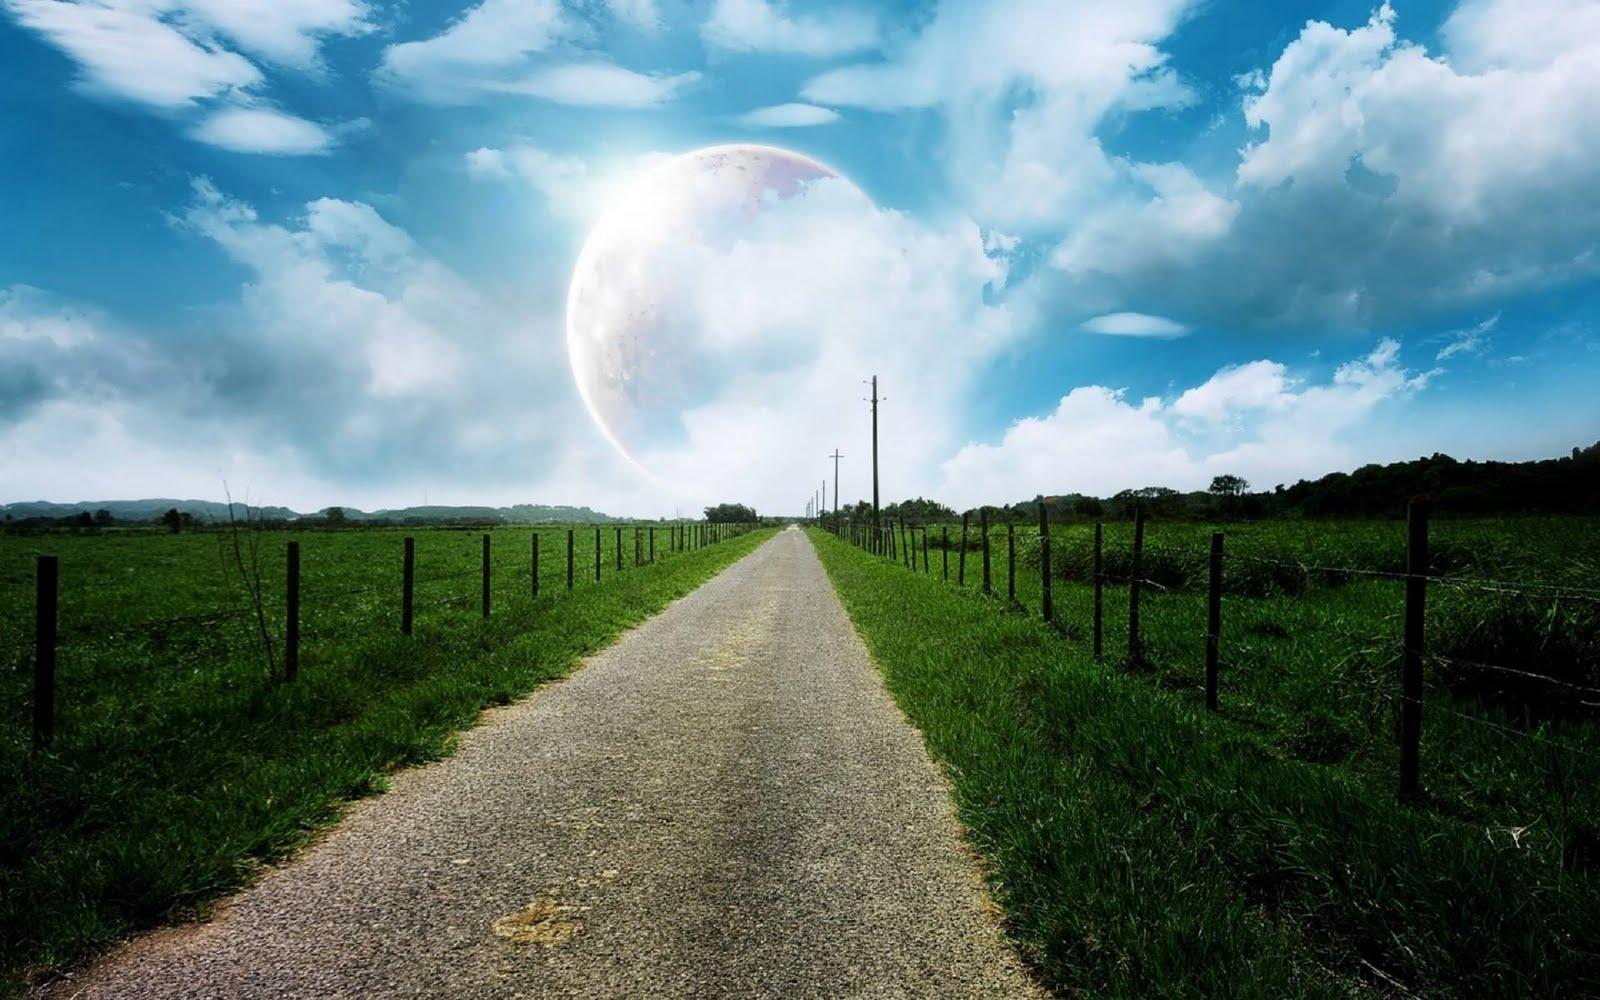 http://1.bp.blogspot.com/_KLJU3hHDGVM/THSMw3iXlUI/AAAAAAAADtM/X011R3Fv4k8/s1600/Dream_way_sky_collections.jpg